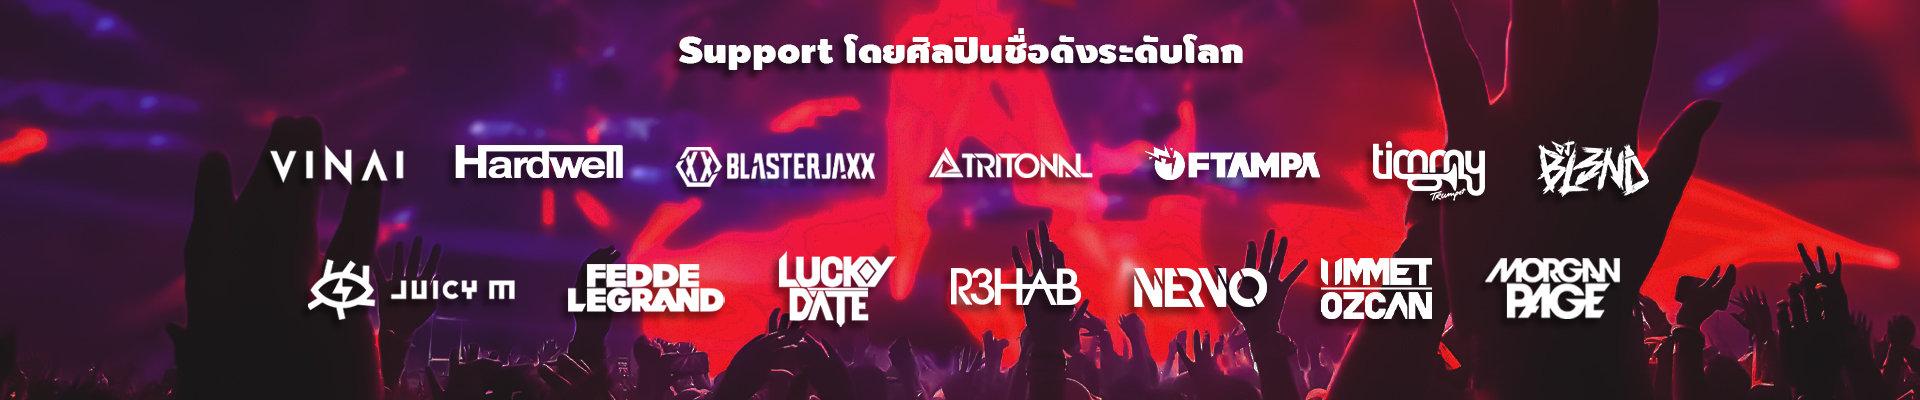 Support Artist.jpg